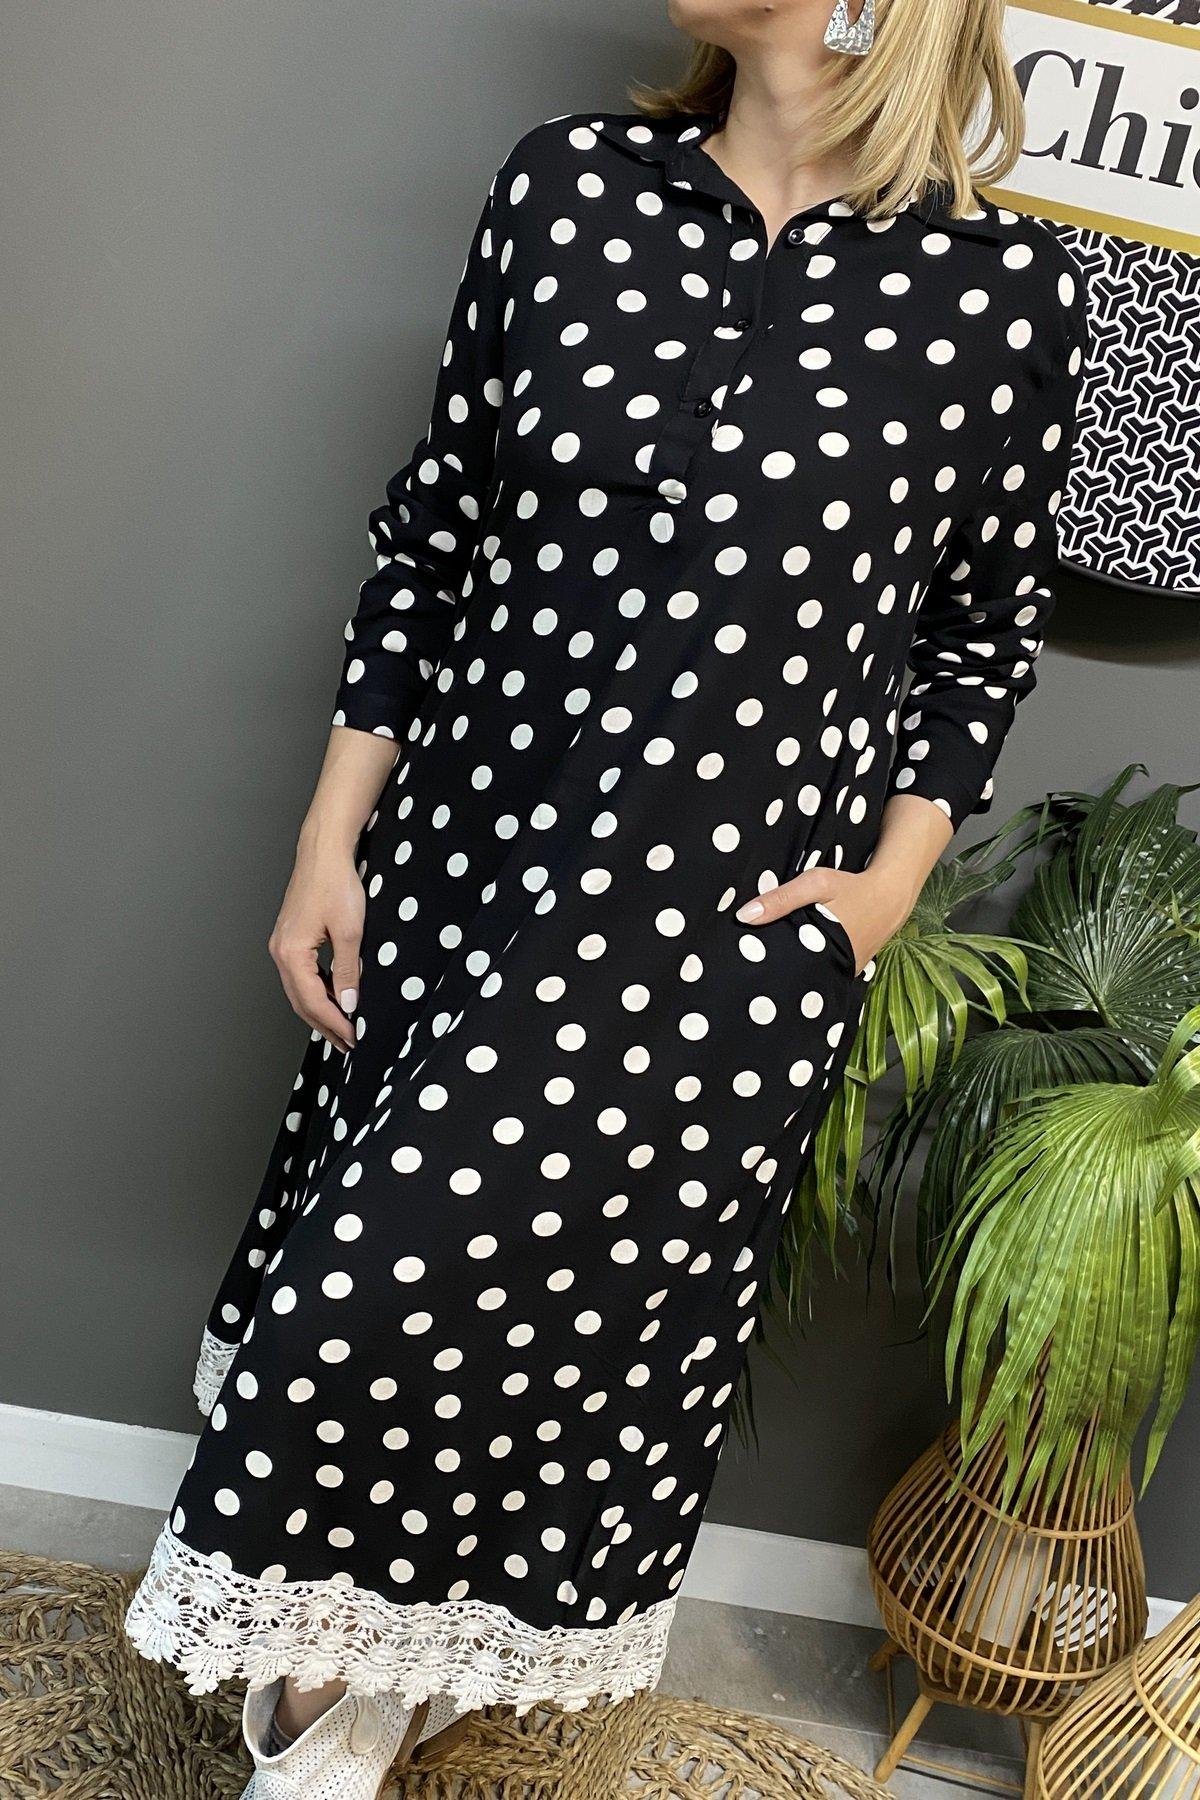 https://resim.chicbag.com.tr/p000648/syb/puantiyeli-elbise-sy-01b03df7188a.